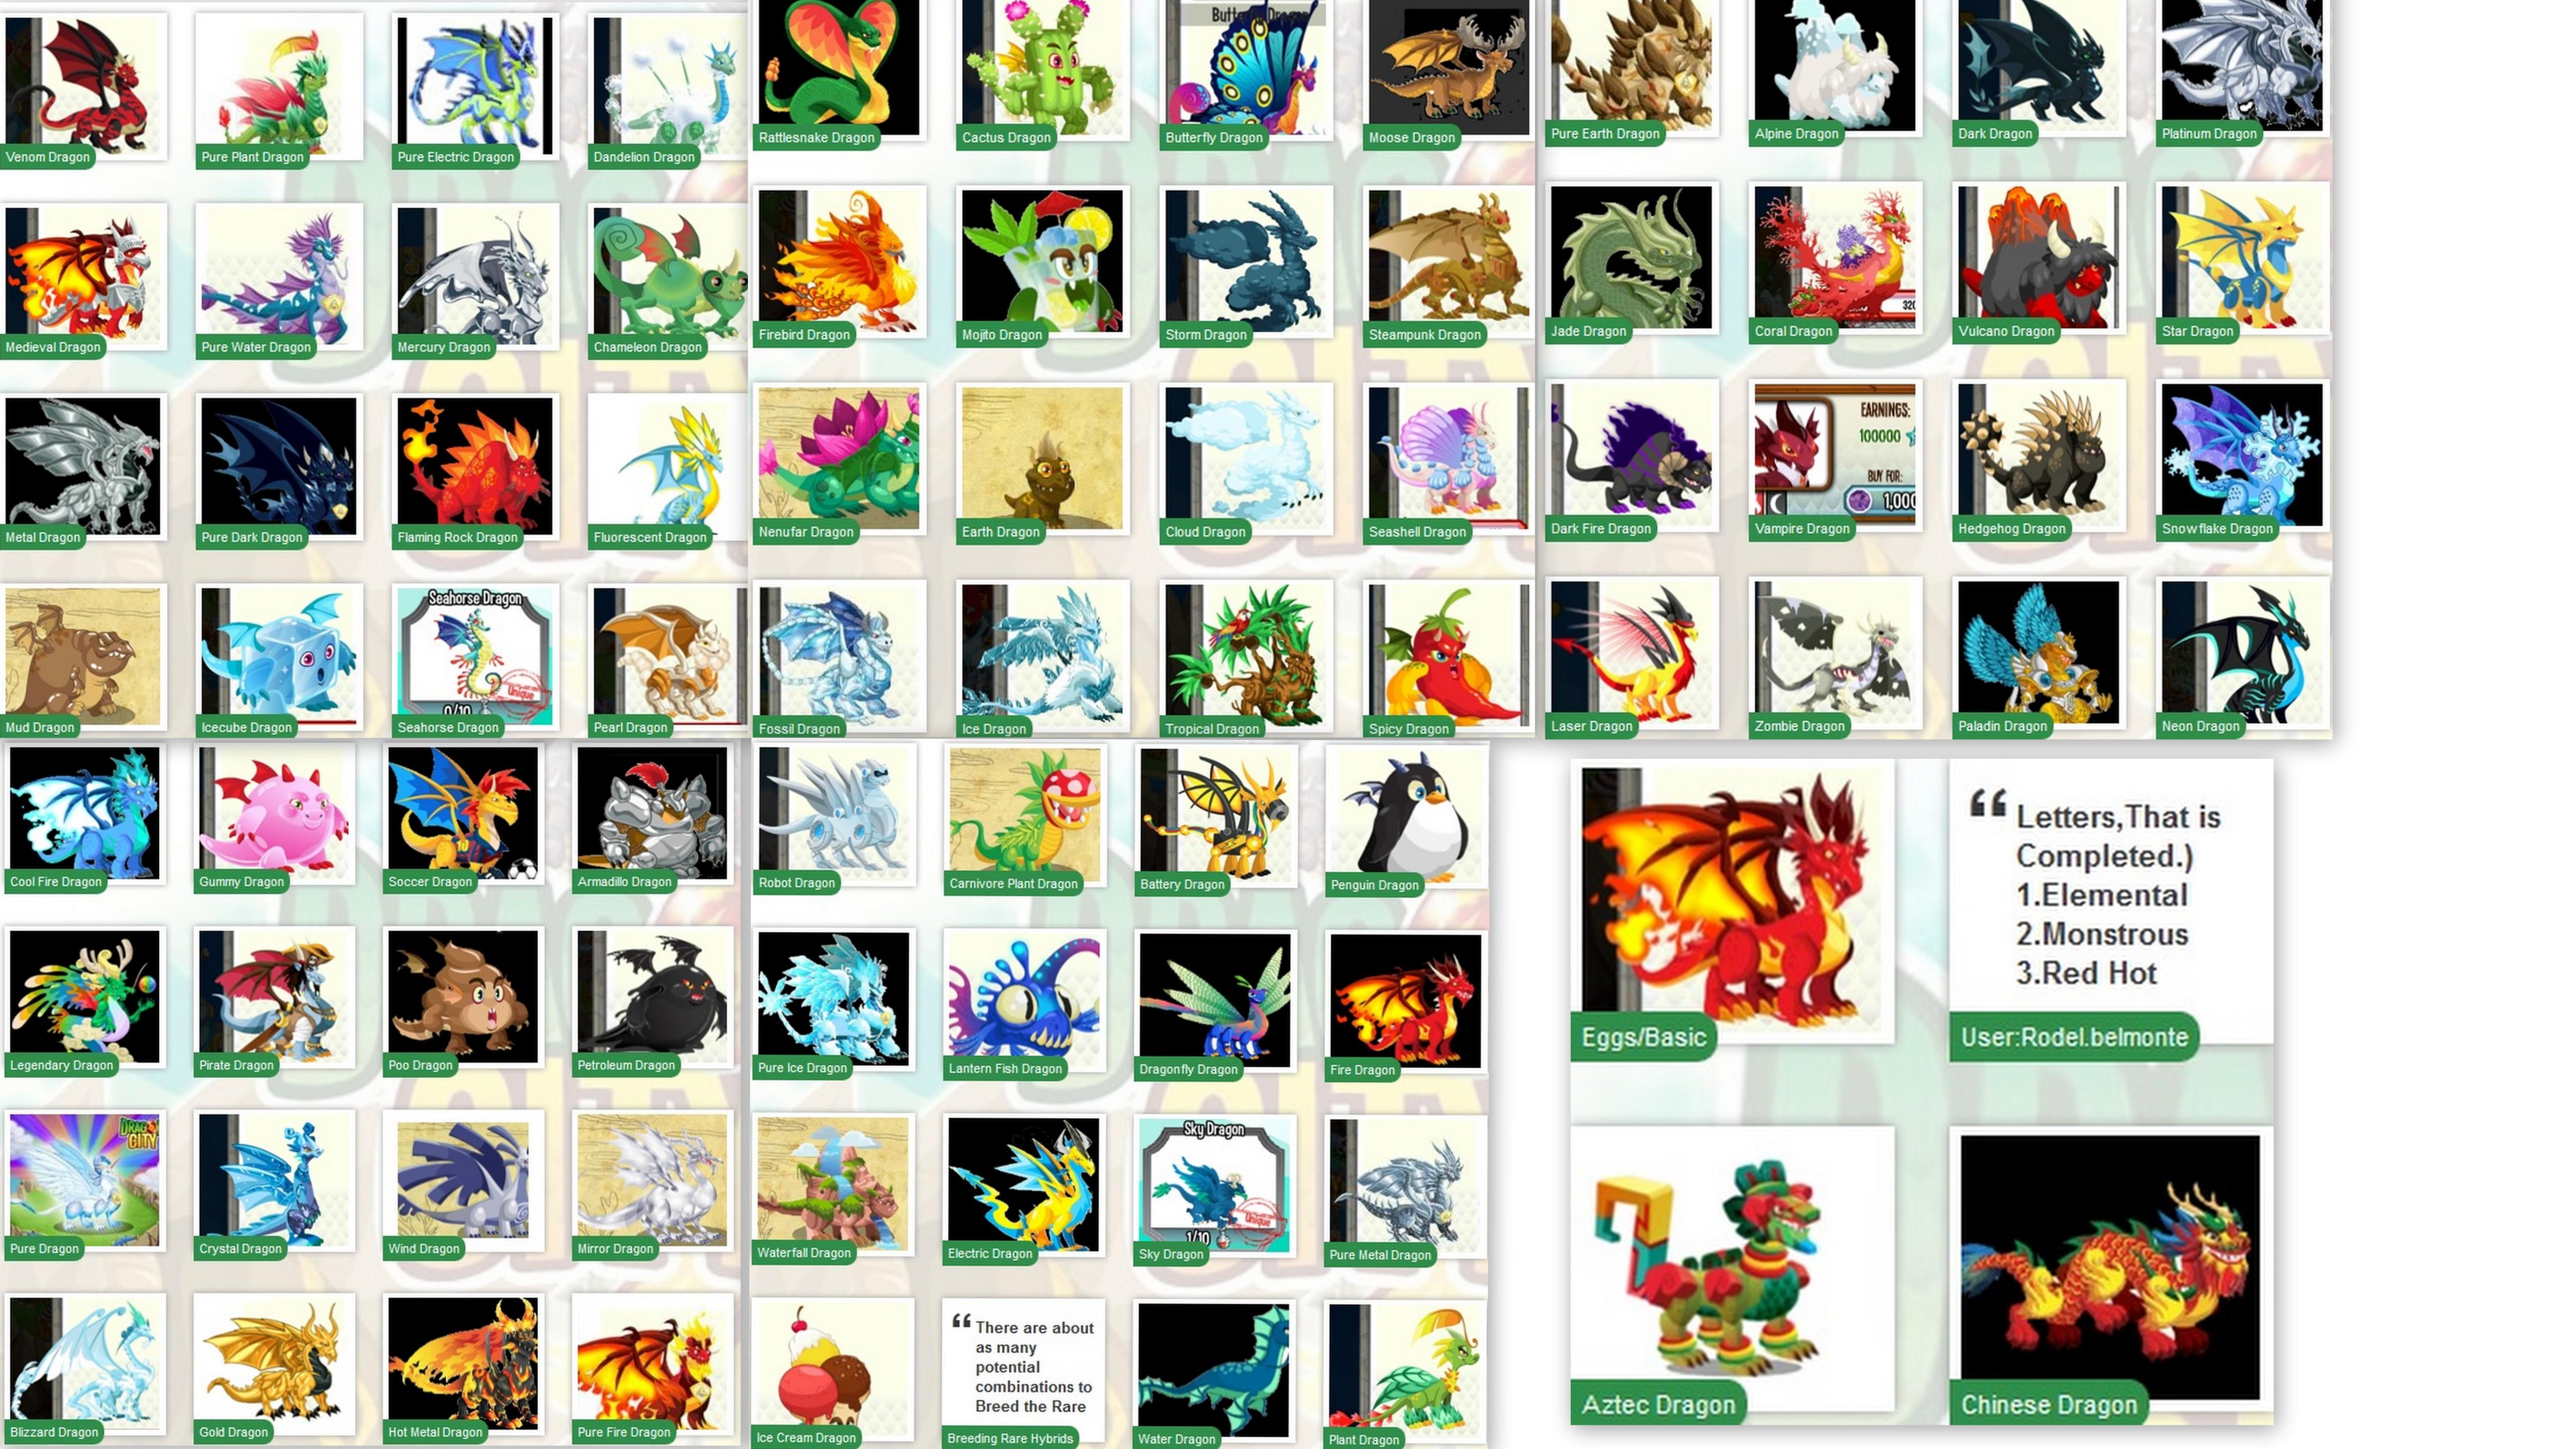 Dragon City Breeding Guide Wallpaper Wallpapersafari